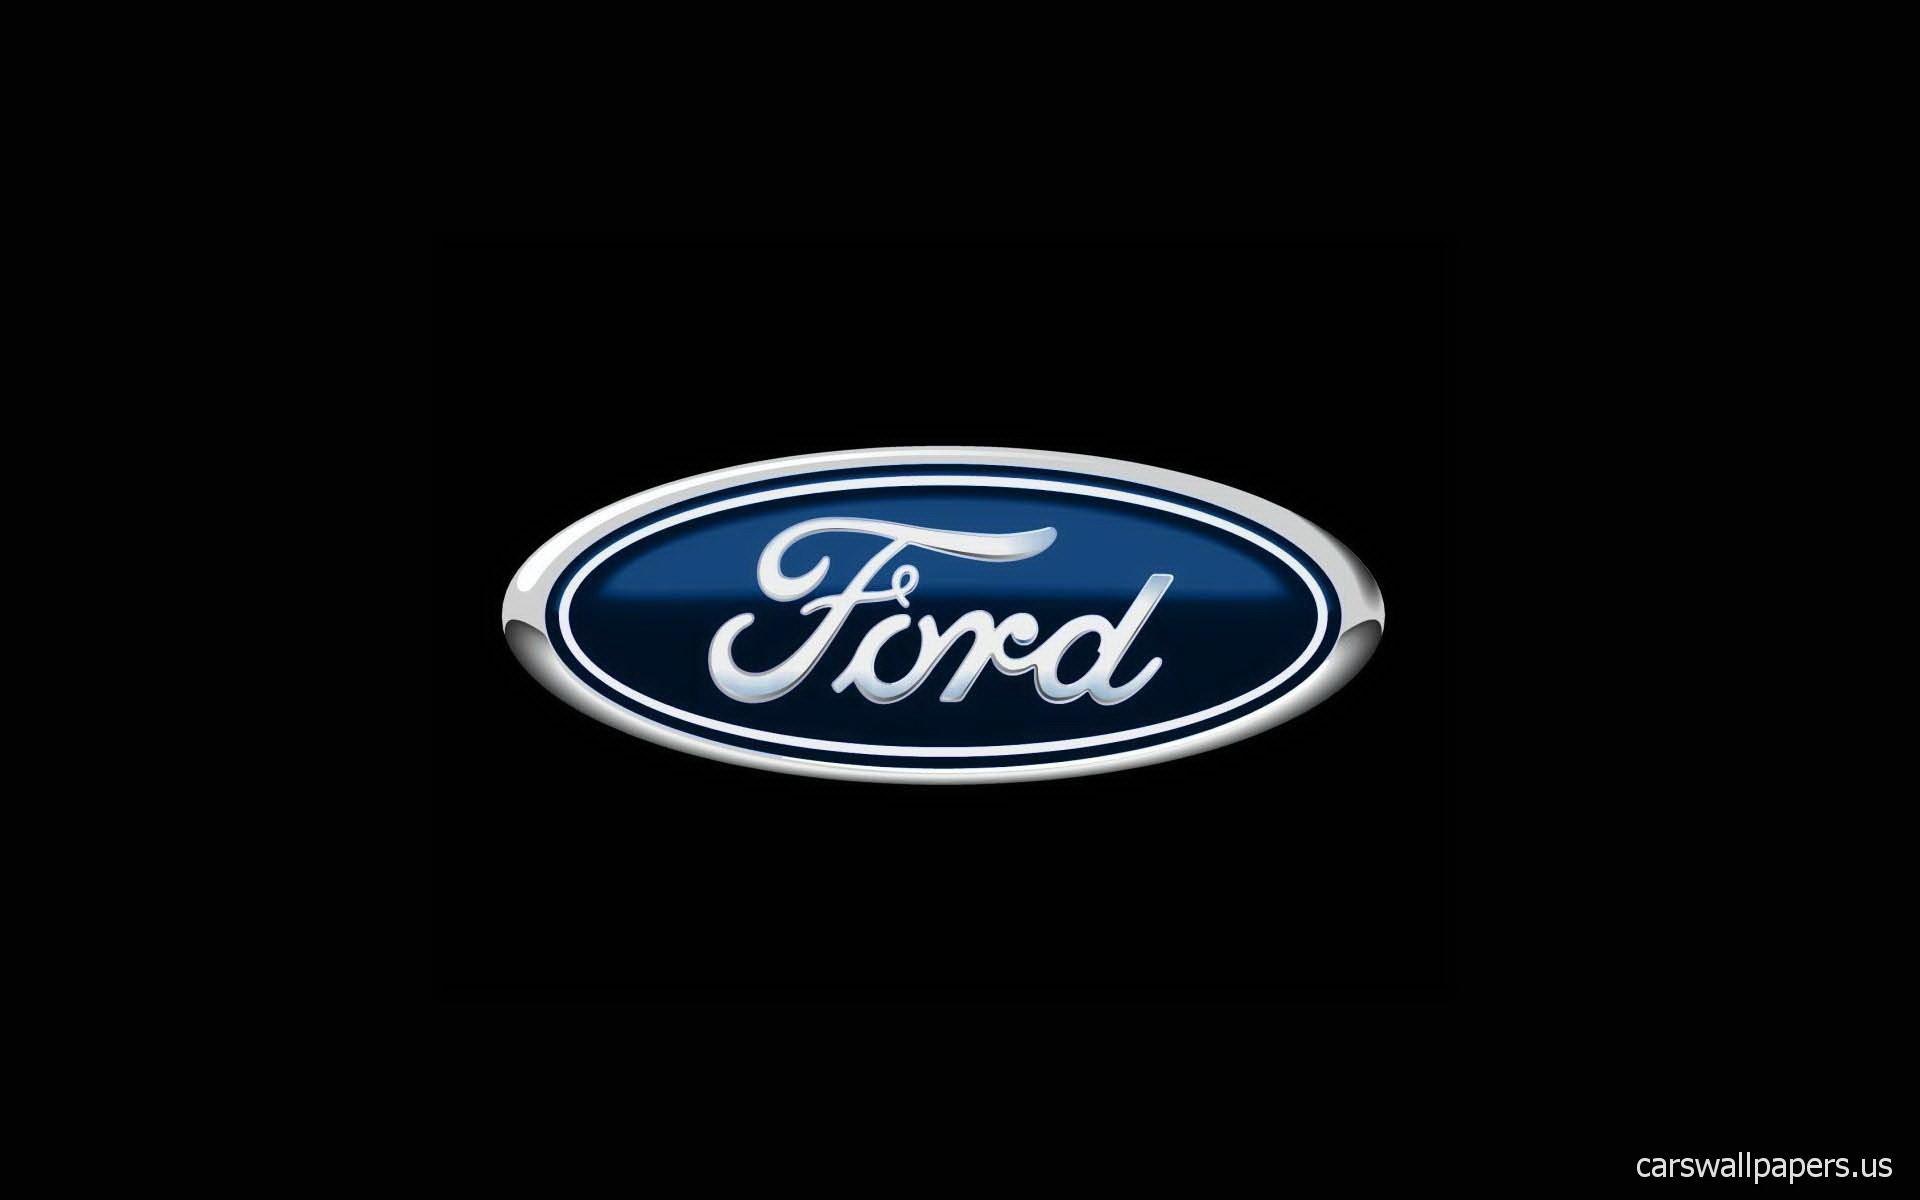 1920x1200 Ford Mustang Logo Wallpaper Name